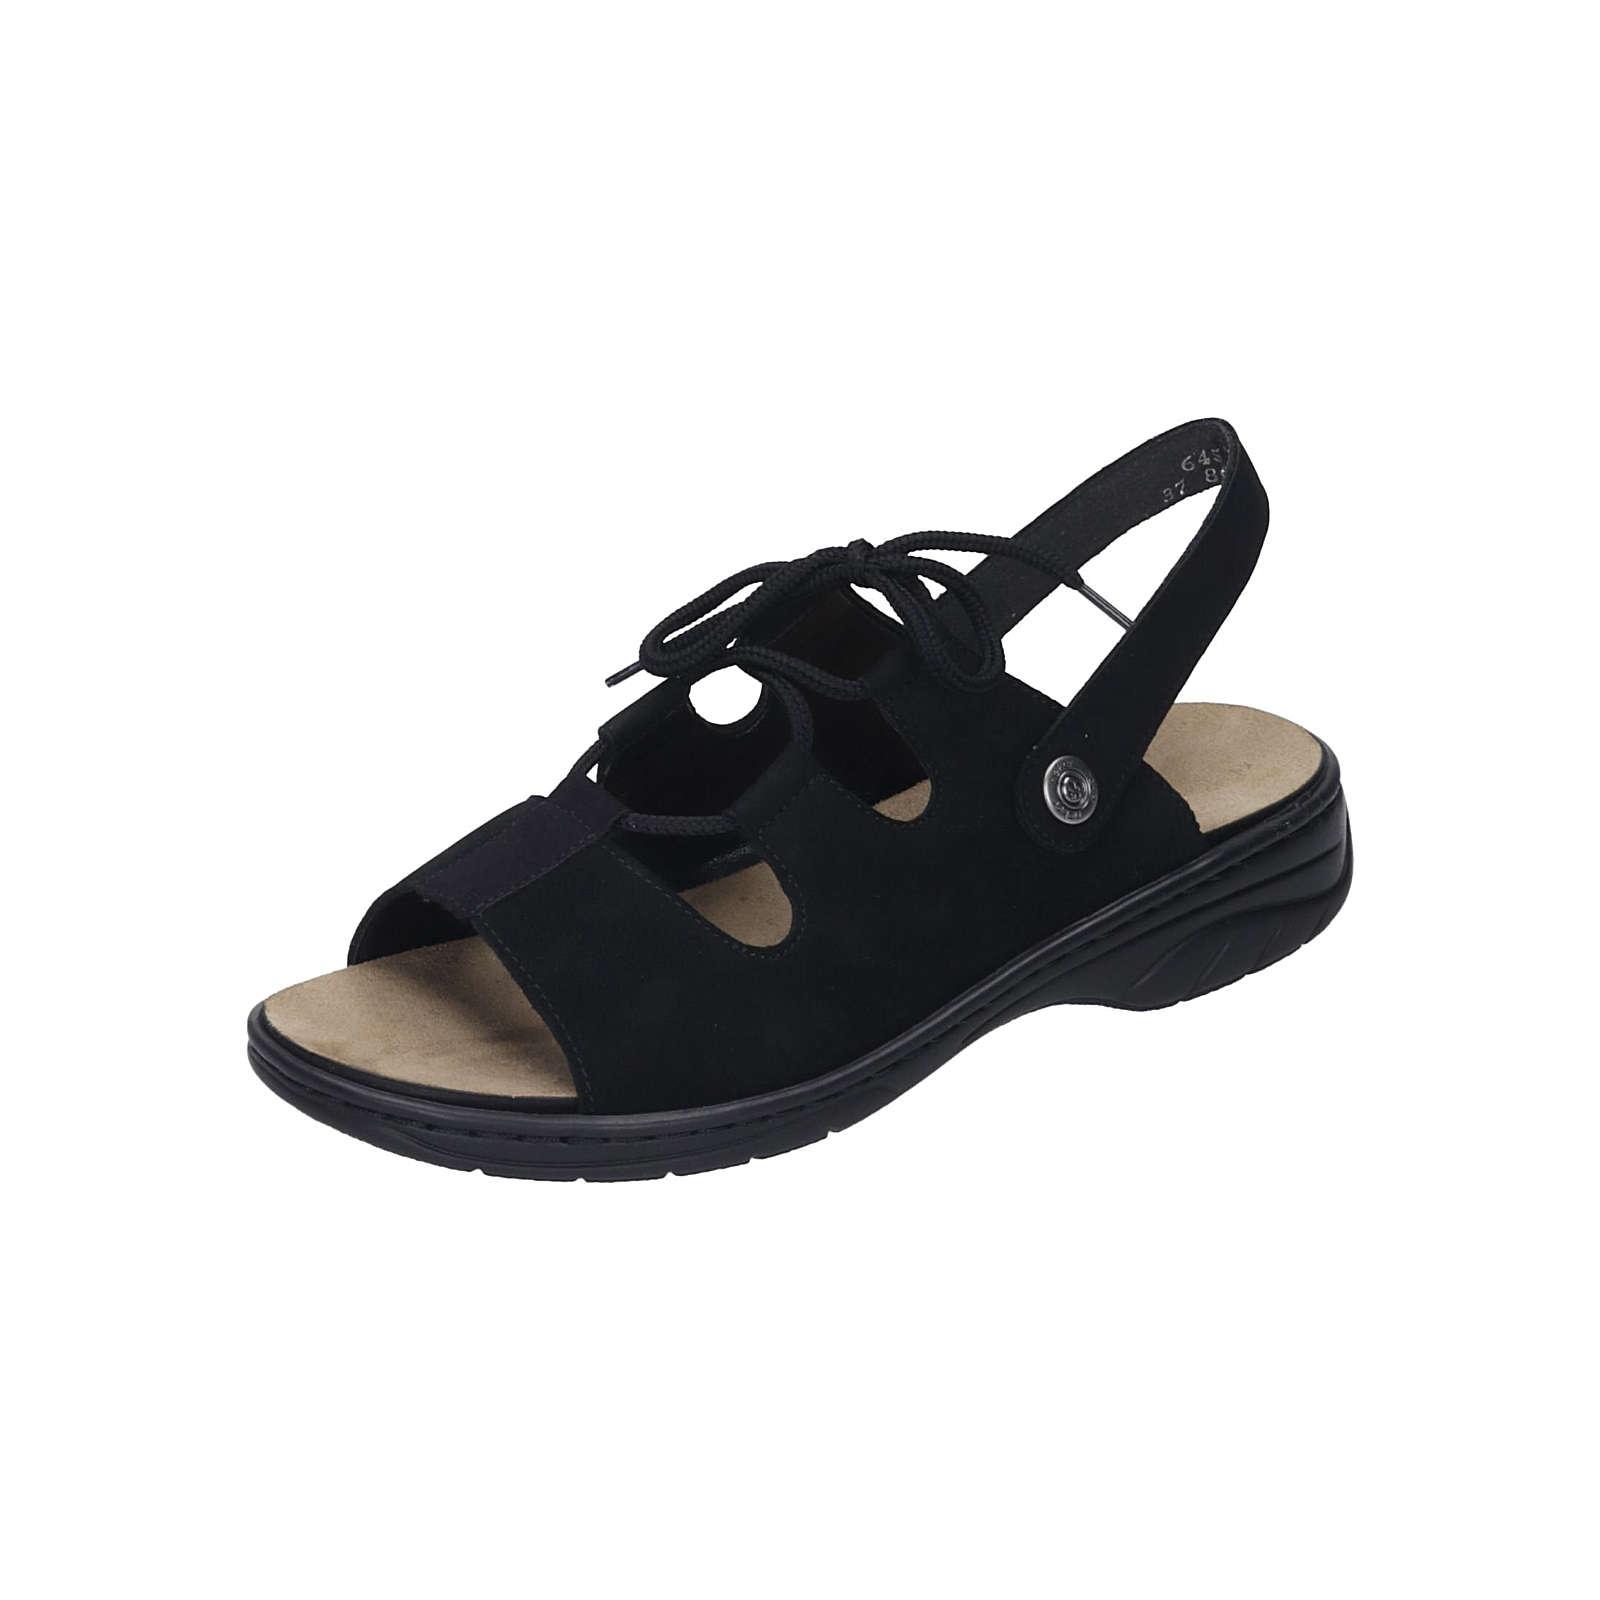 rieker Damen Sandalette Klassische Sandaletten schwarz Damen Gr. 37